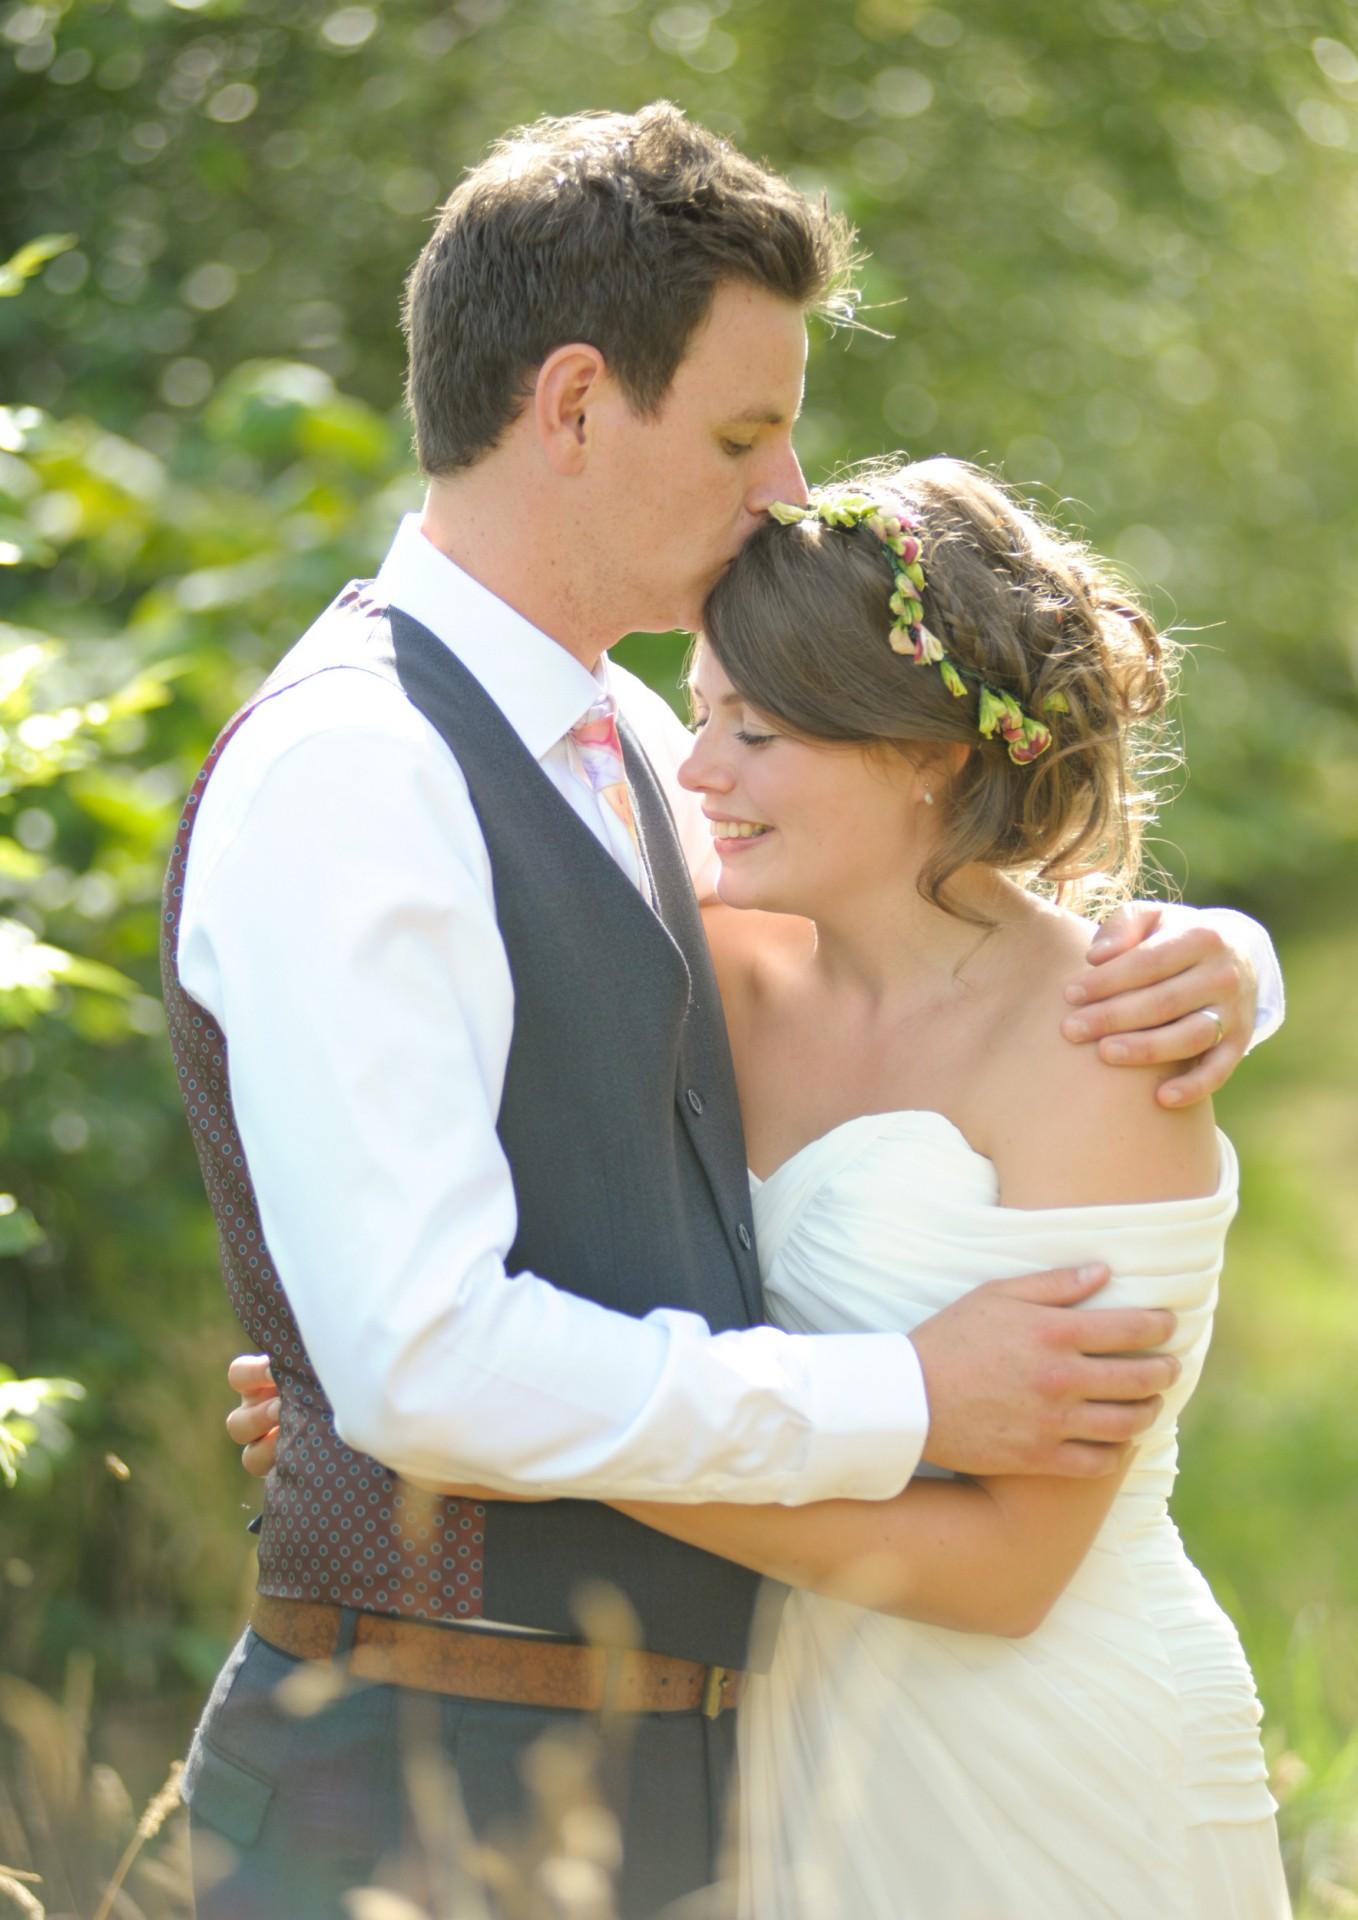 Millie_Dan_DIY-Wedding_028